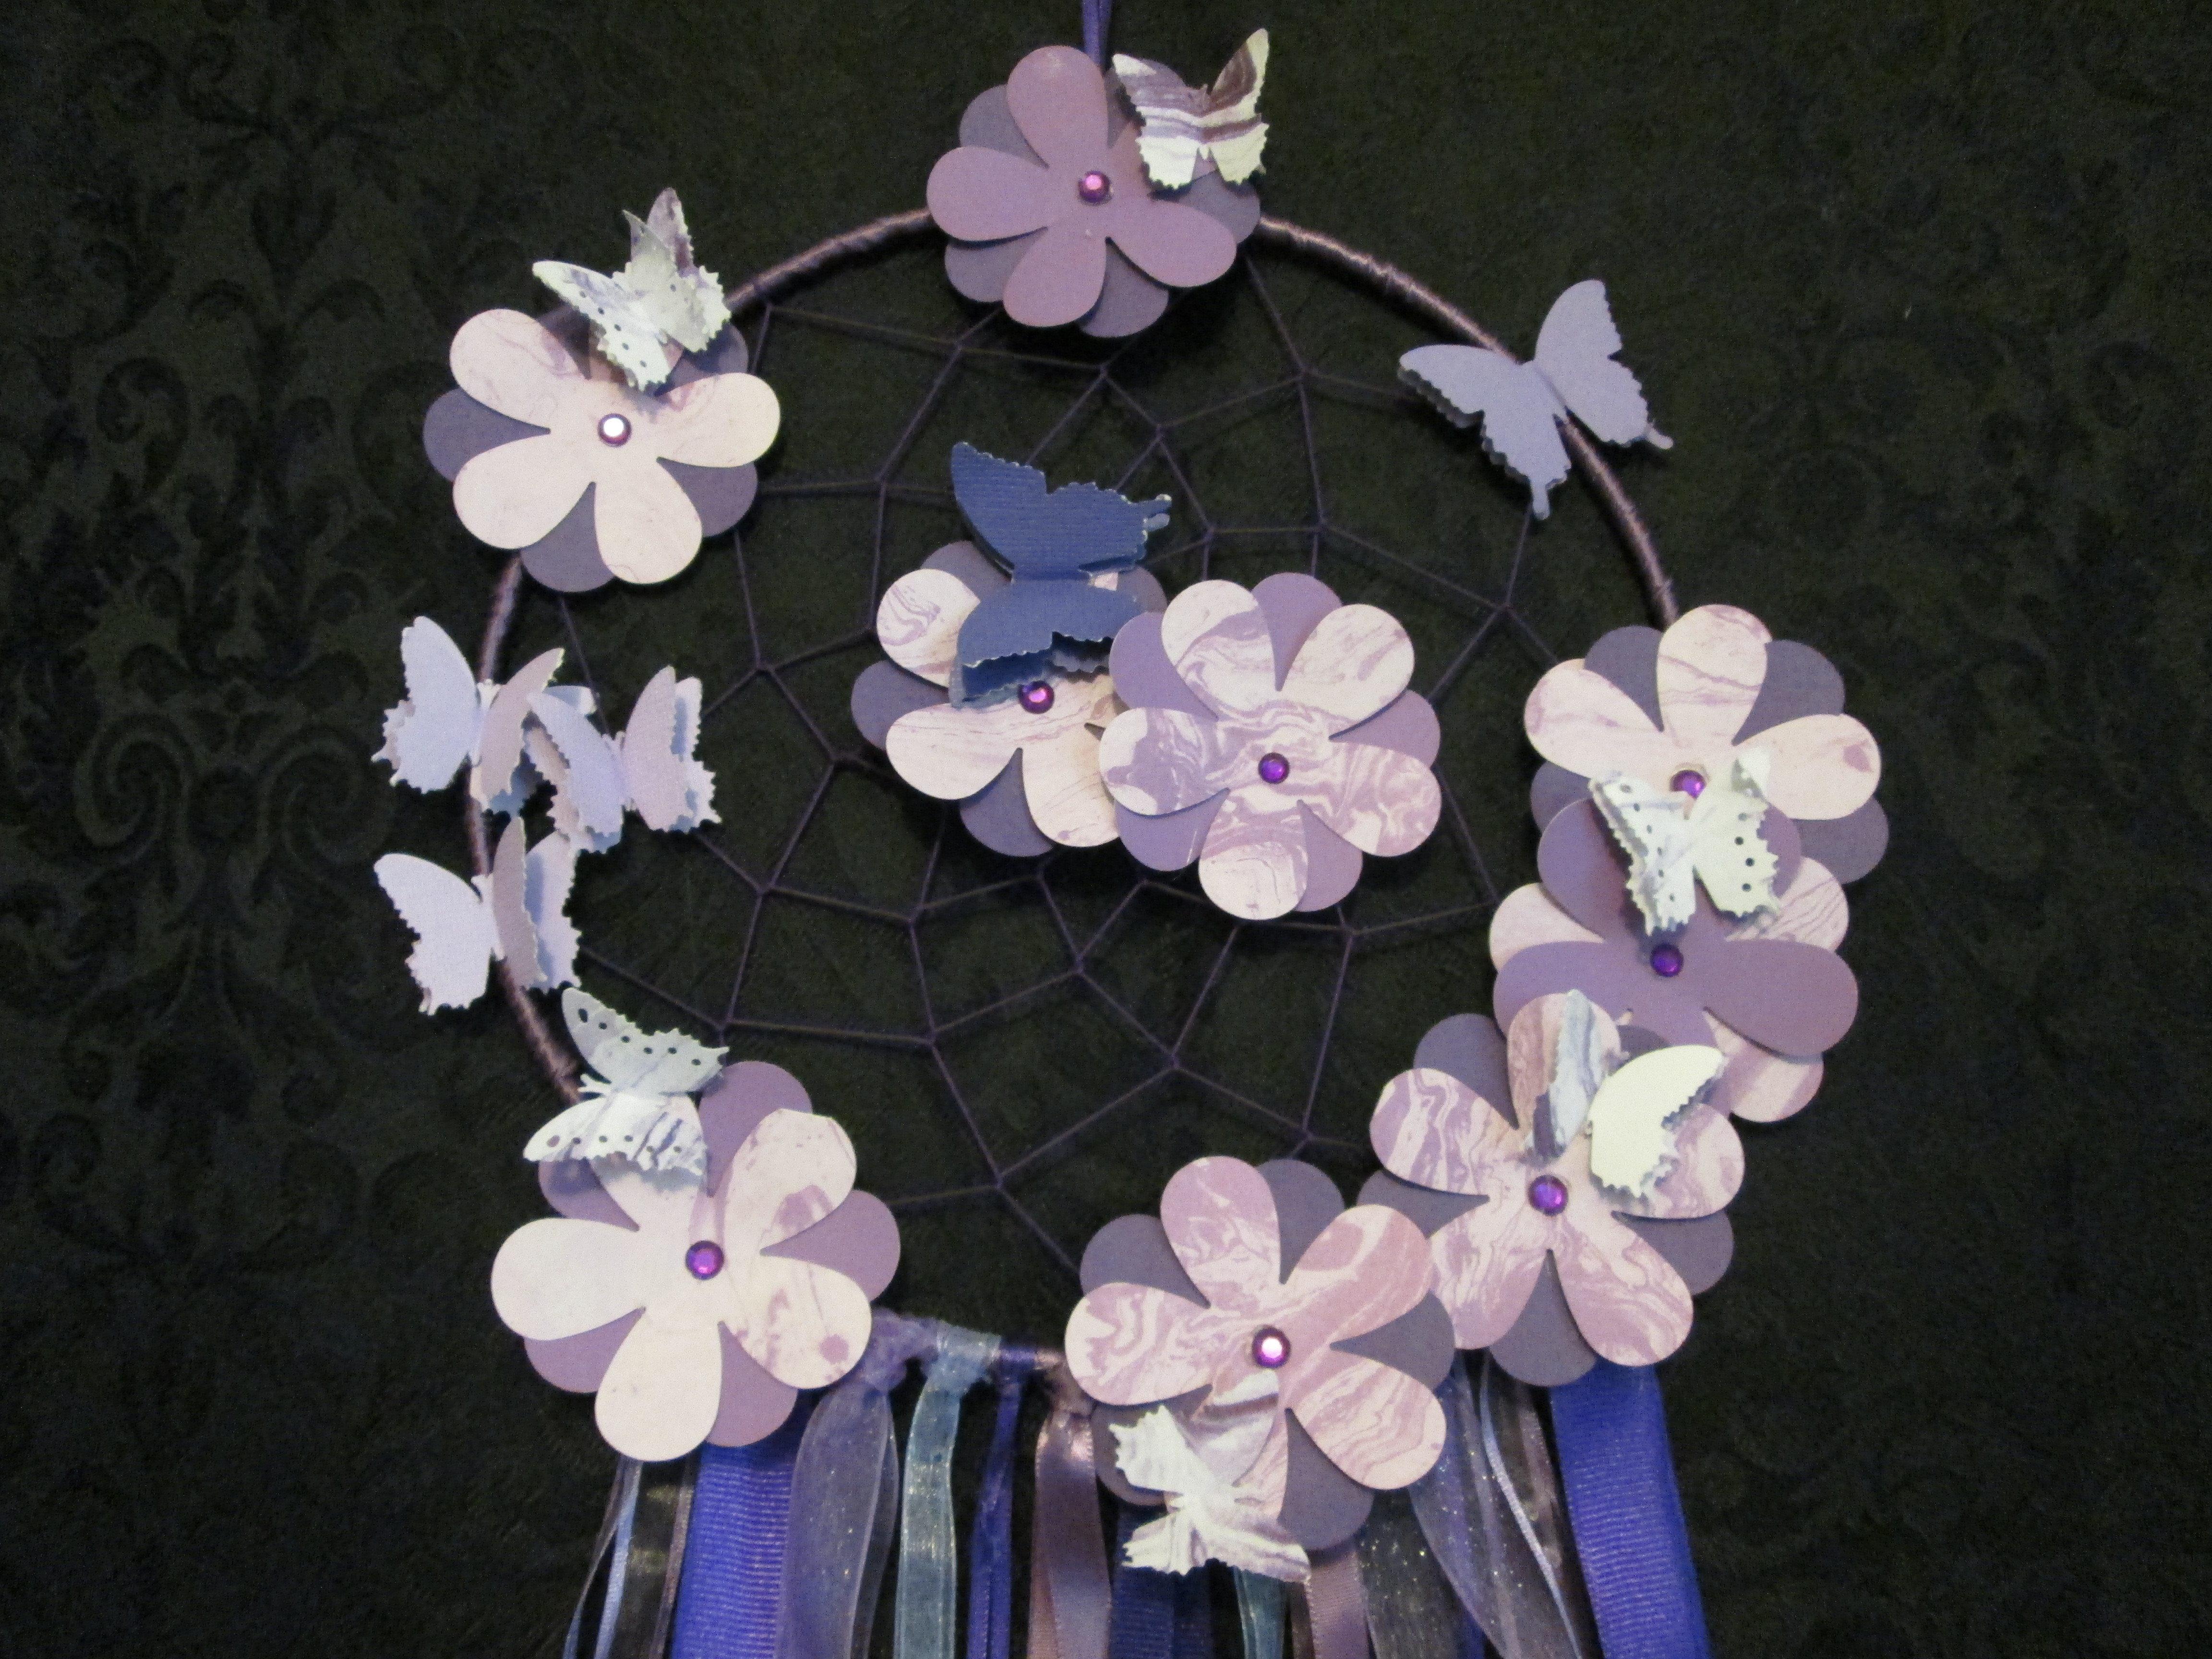 Purple Dreamcatcher w/flowers - Large